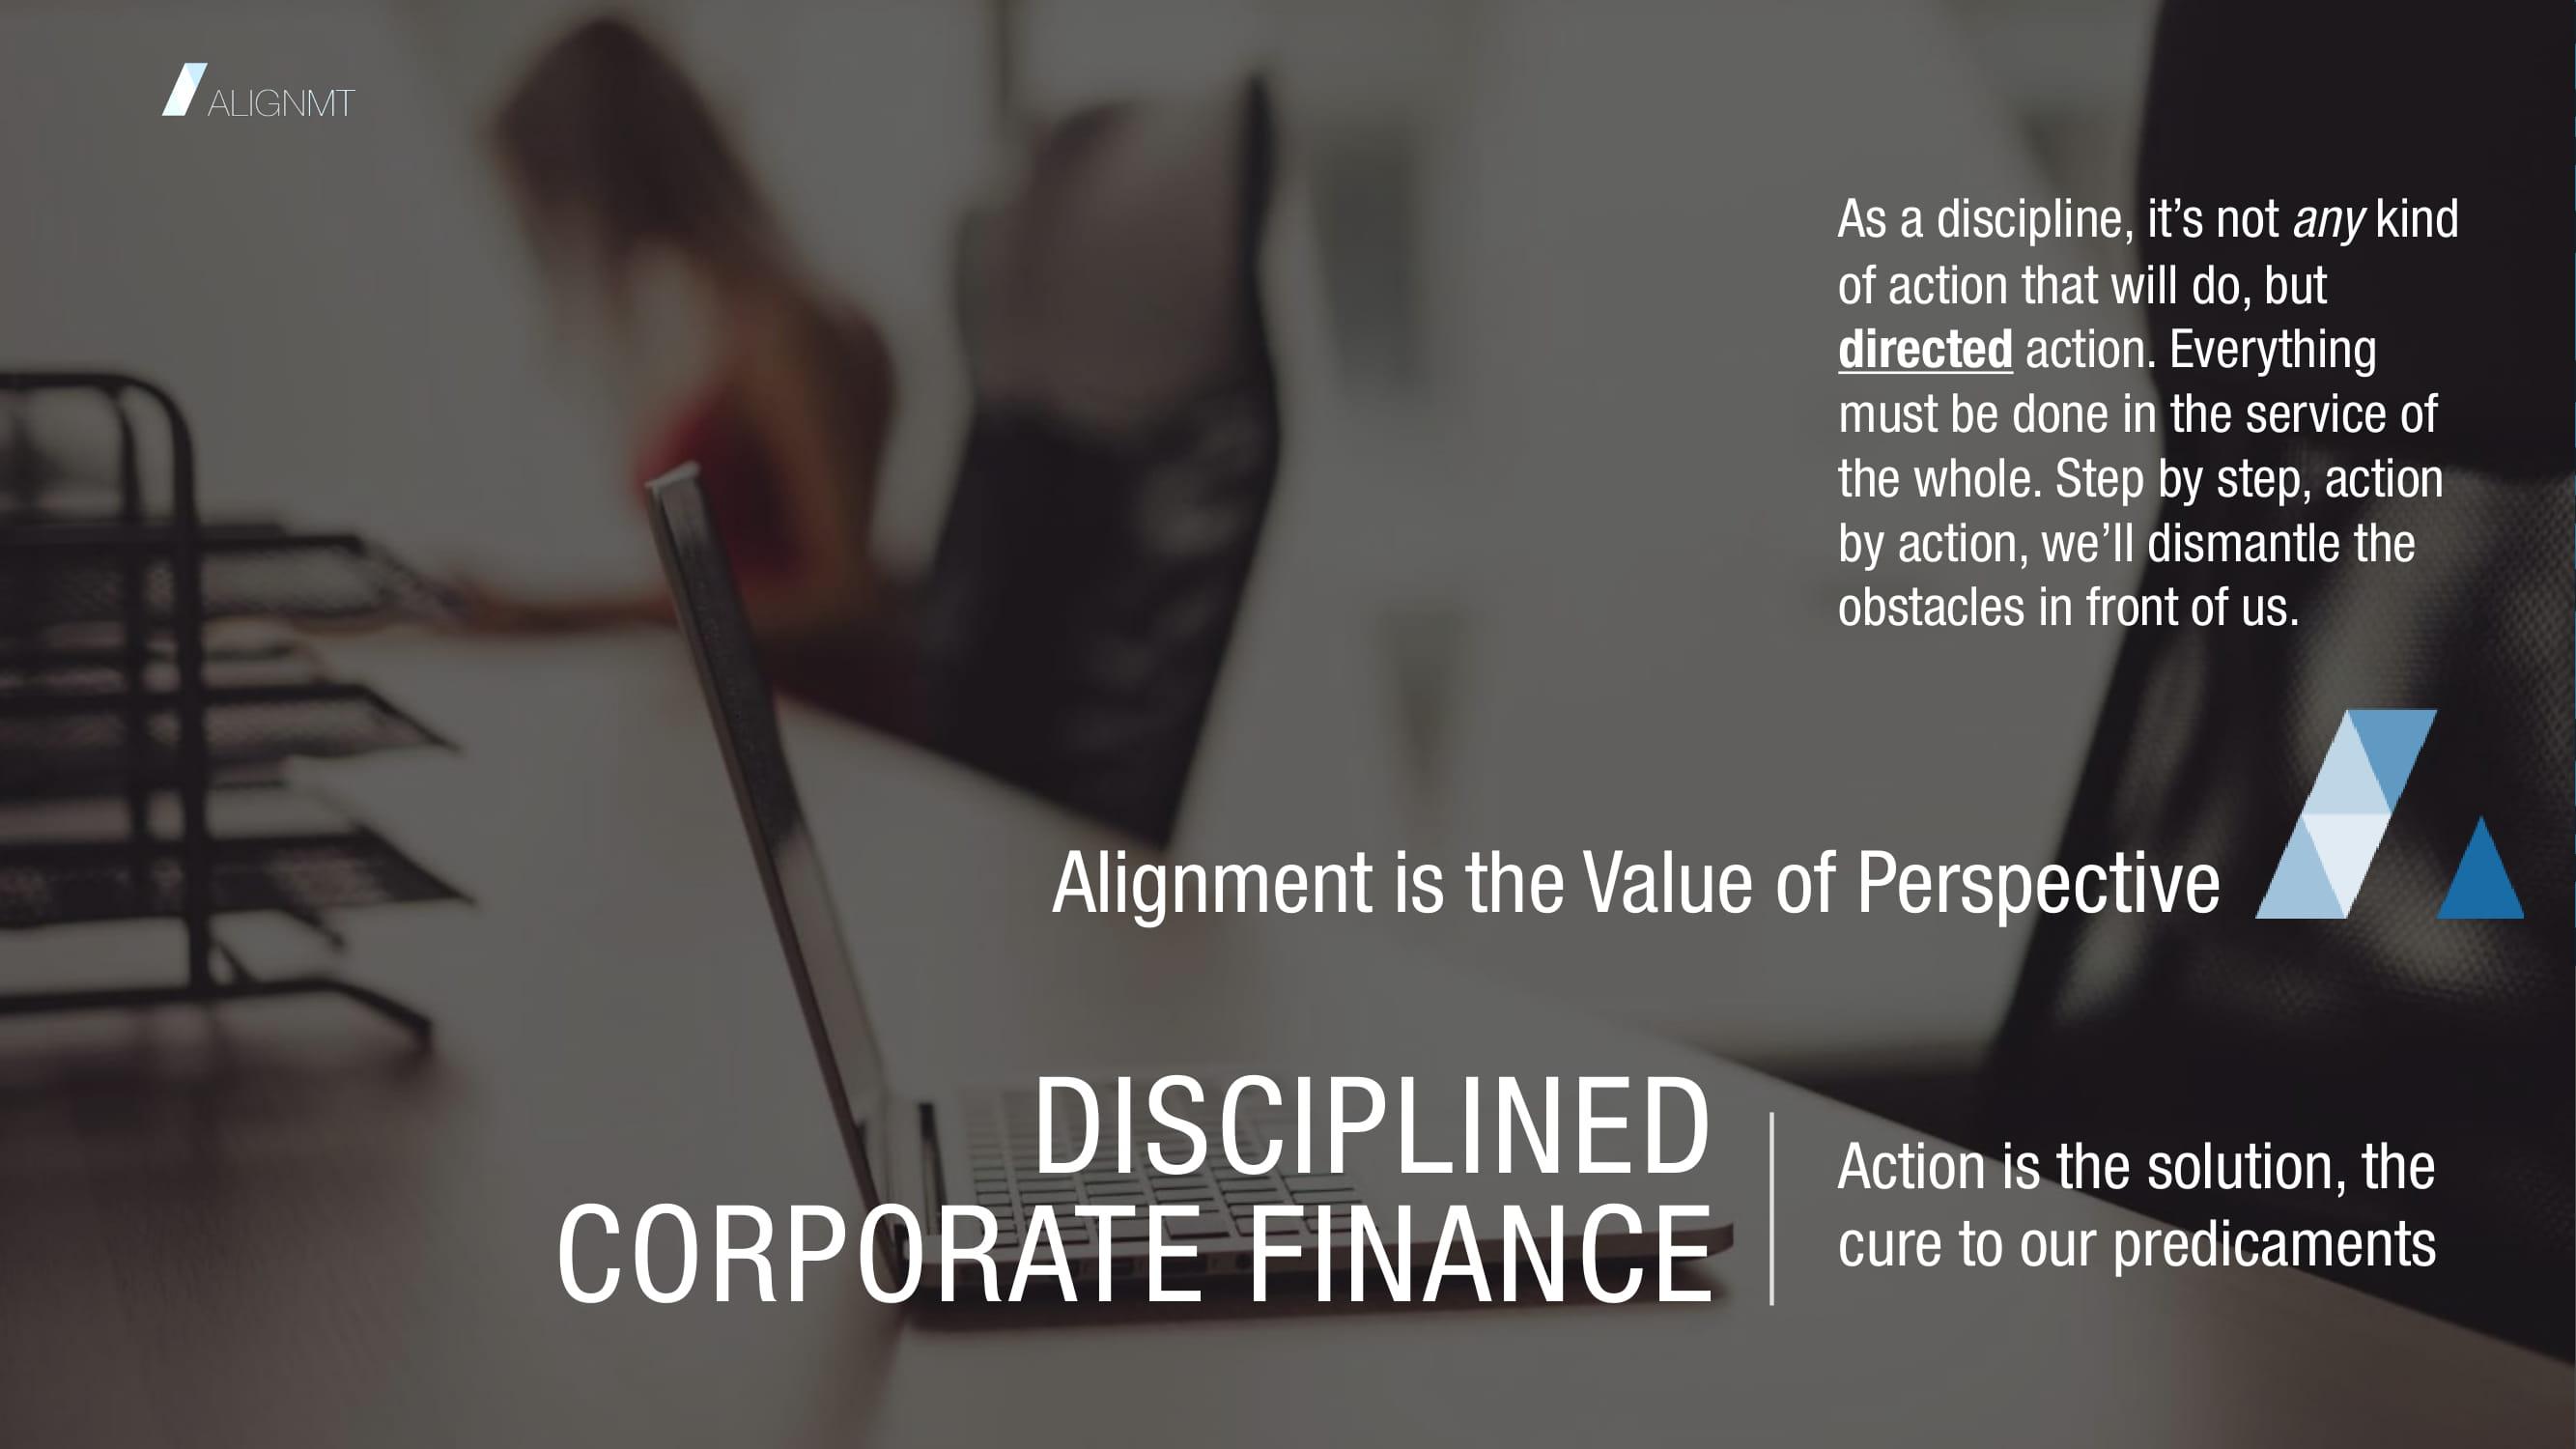 ALIGNMT Disciplined Corporate Finance